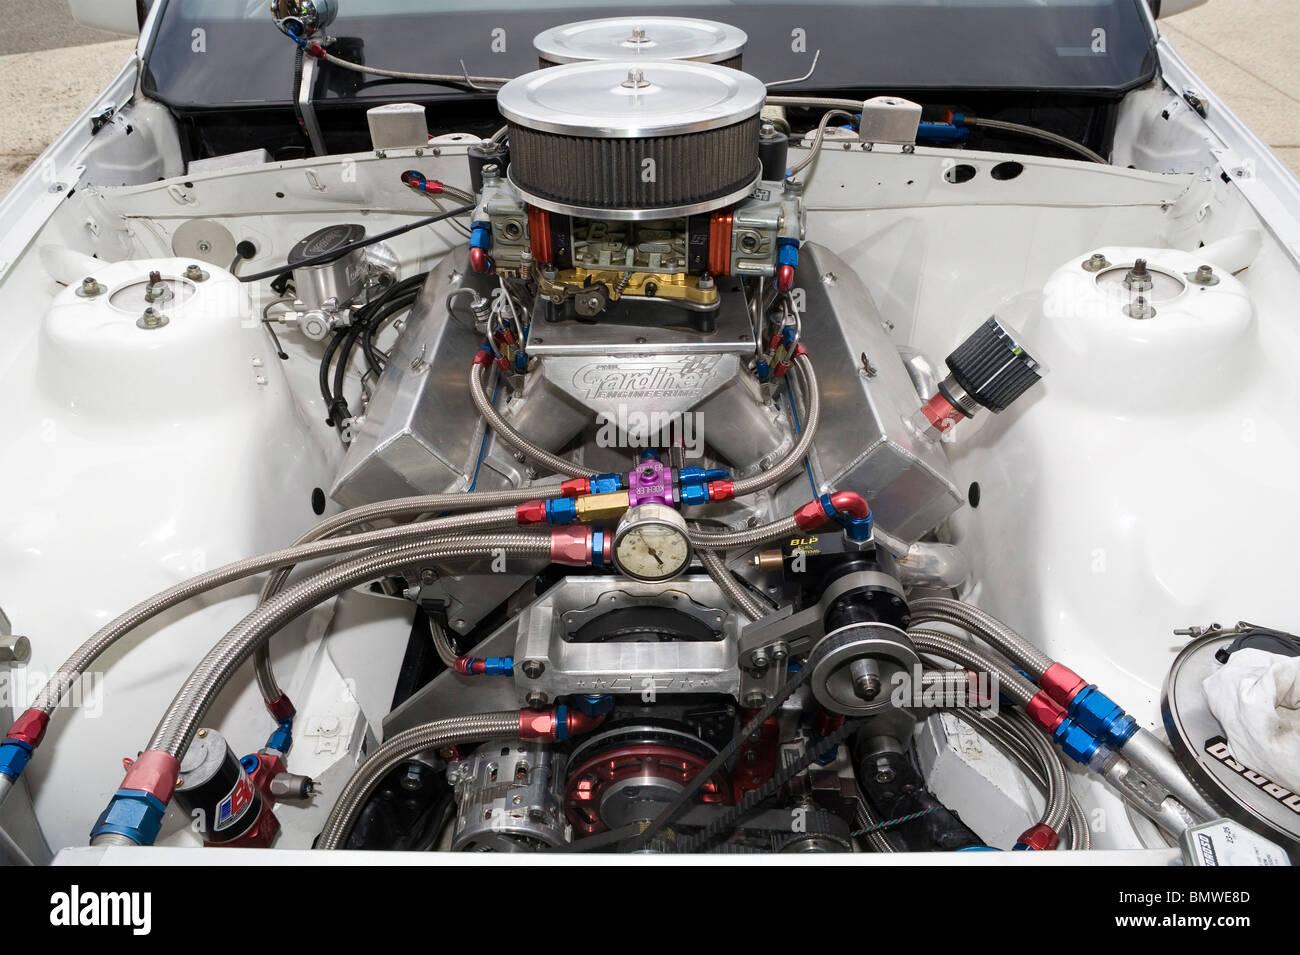 hight resolution of high power v8 drag racing engine stock image